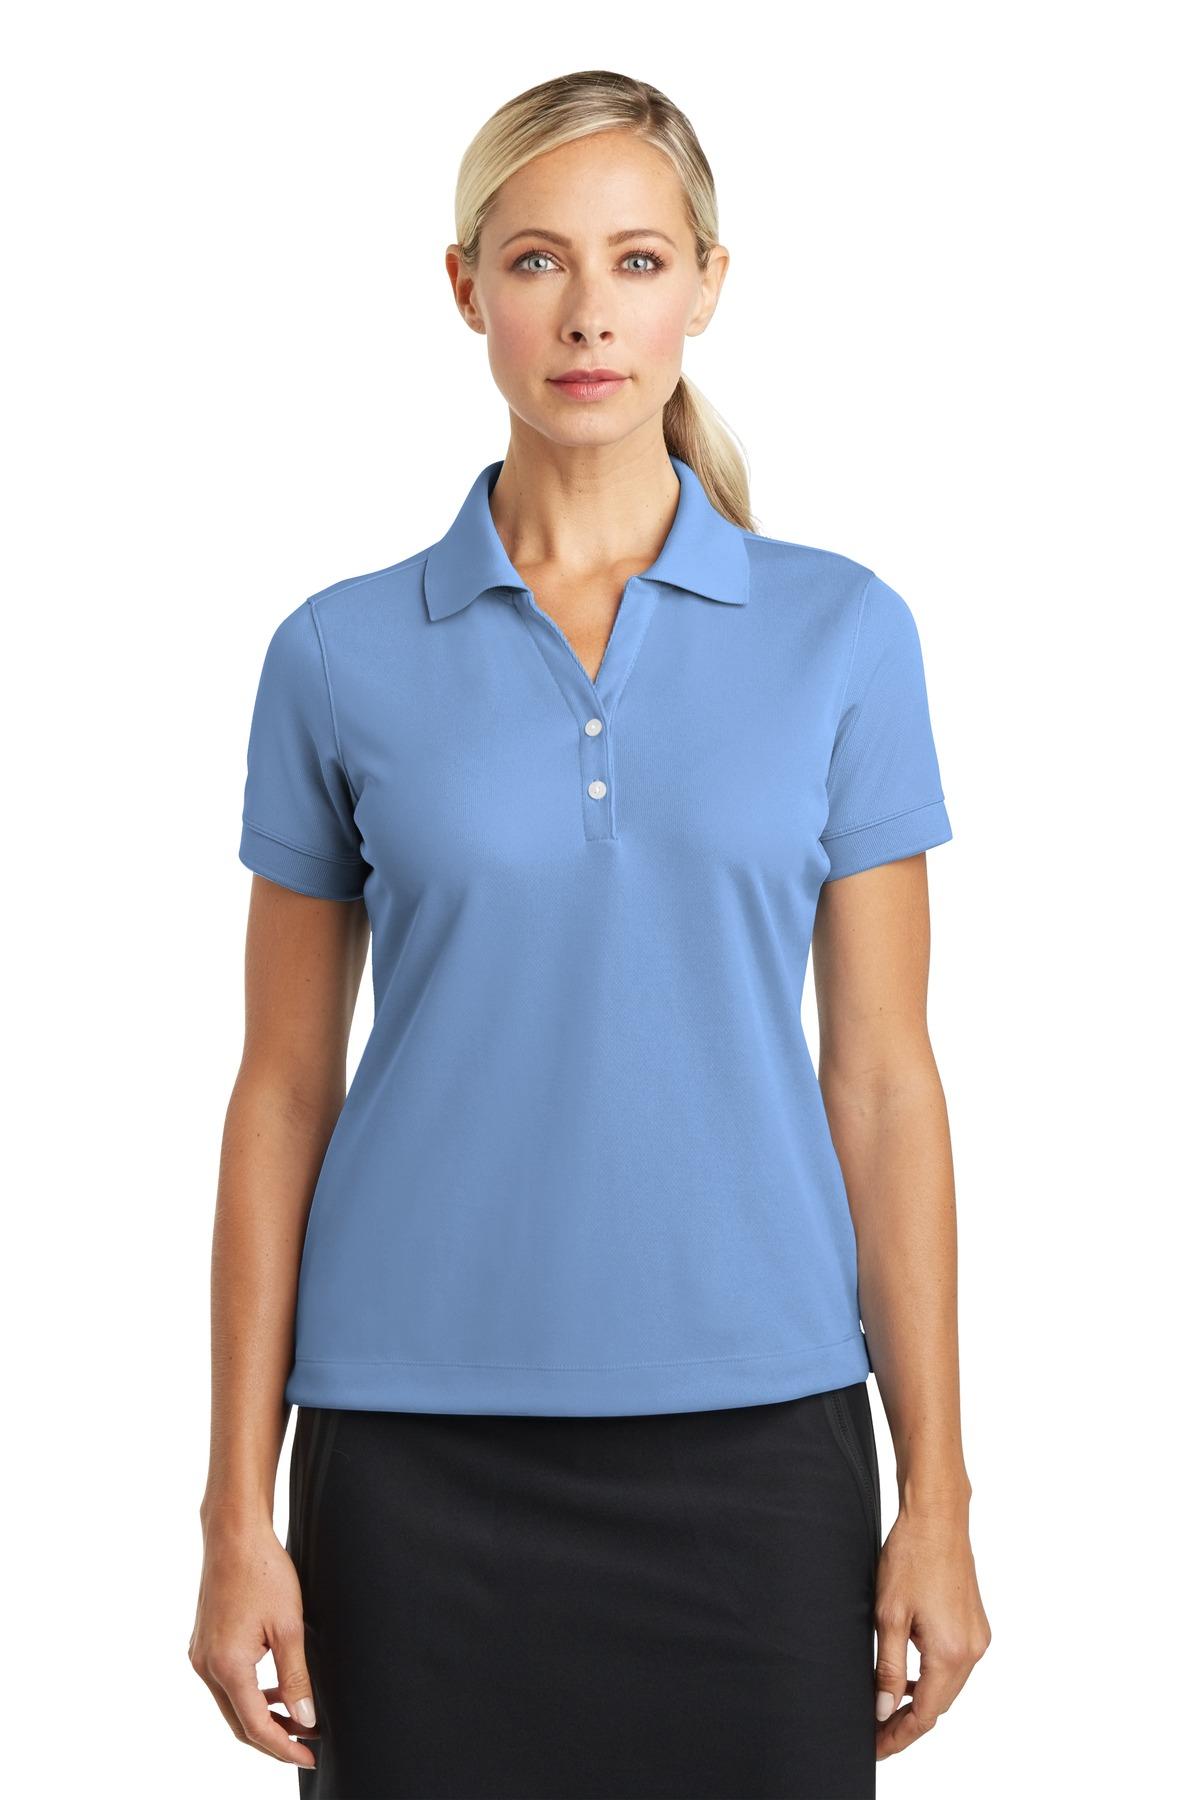 Nike Golf - Ladies Dri-FIT Classic Polo. 286772